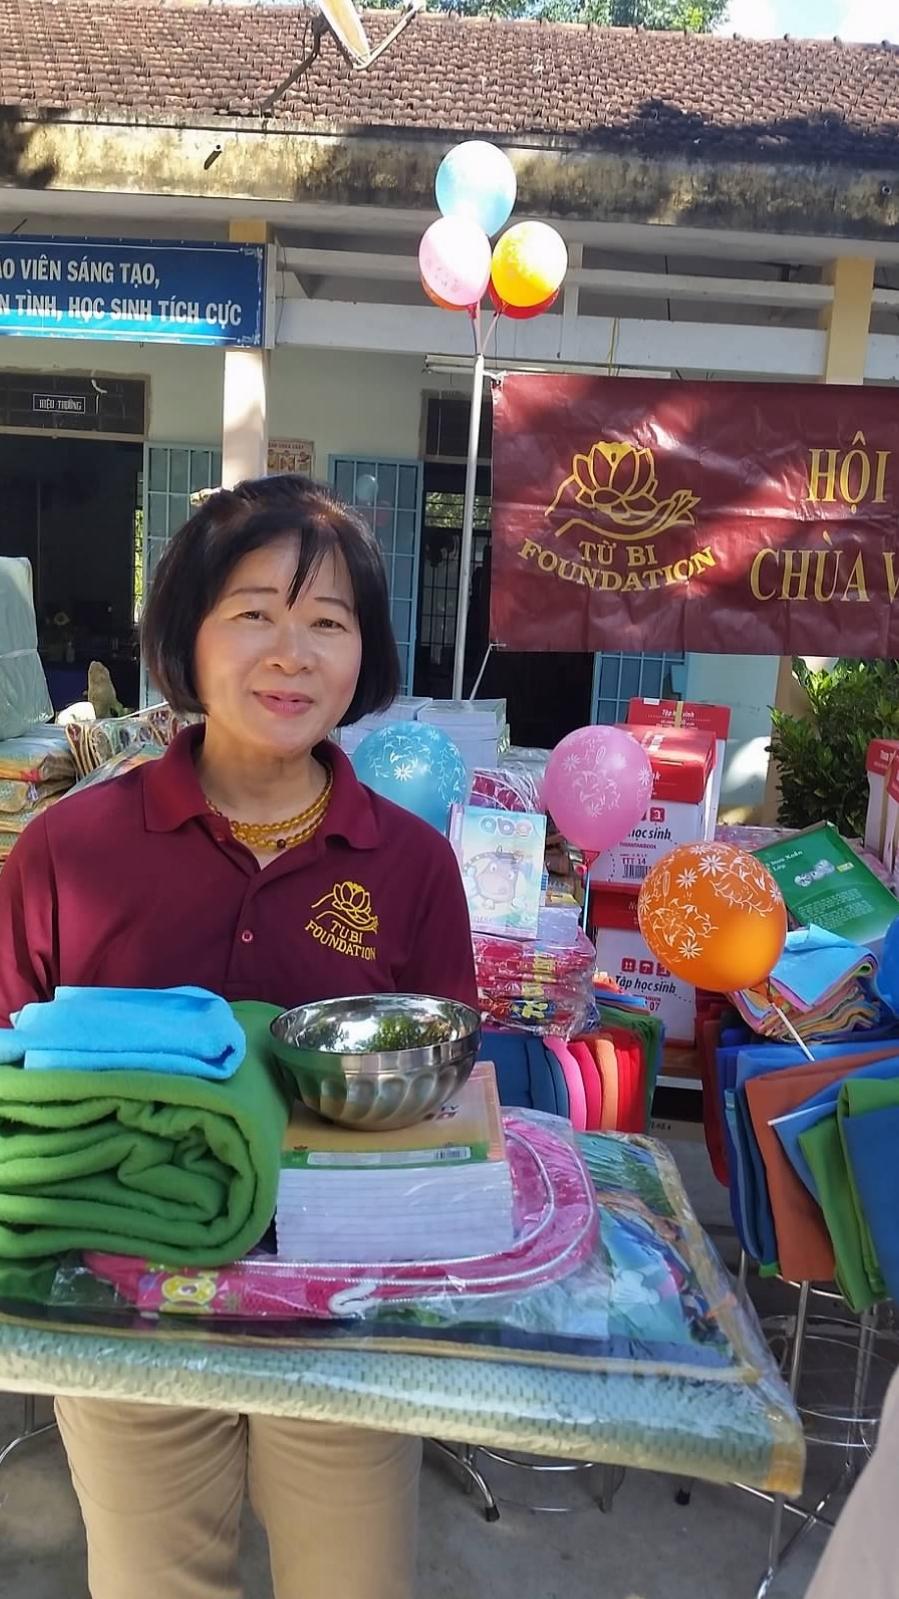 TQ Tieu Hoc Khanh Thuong 38